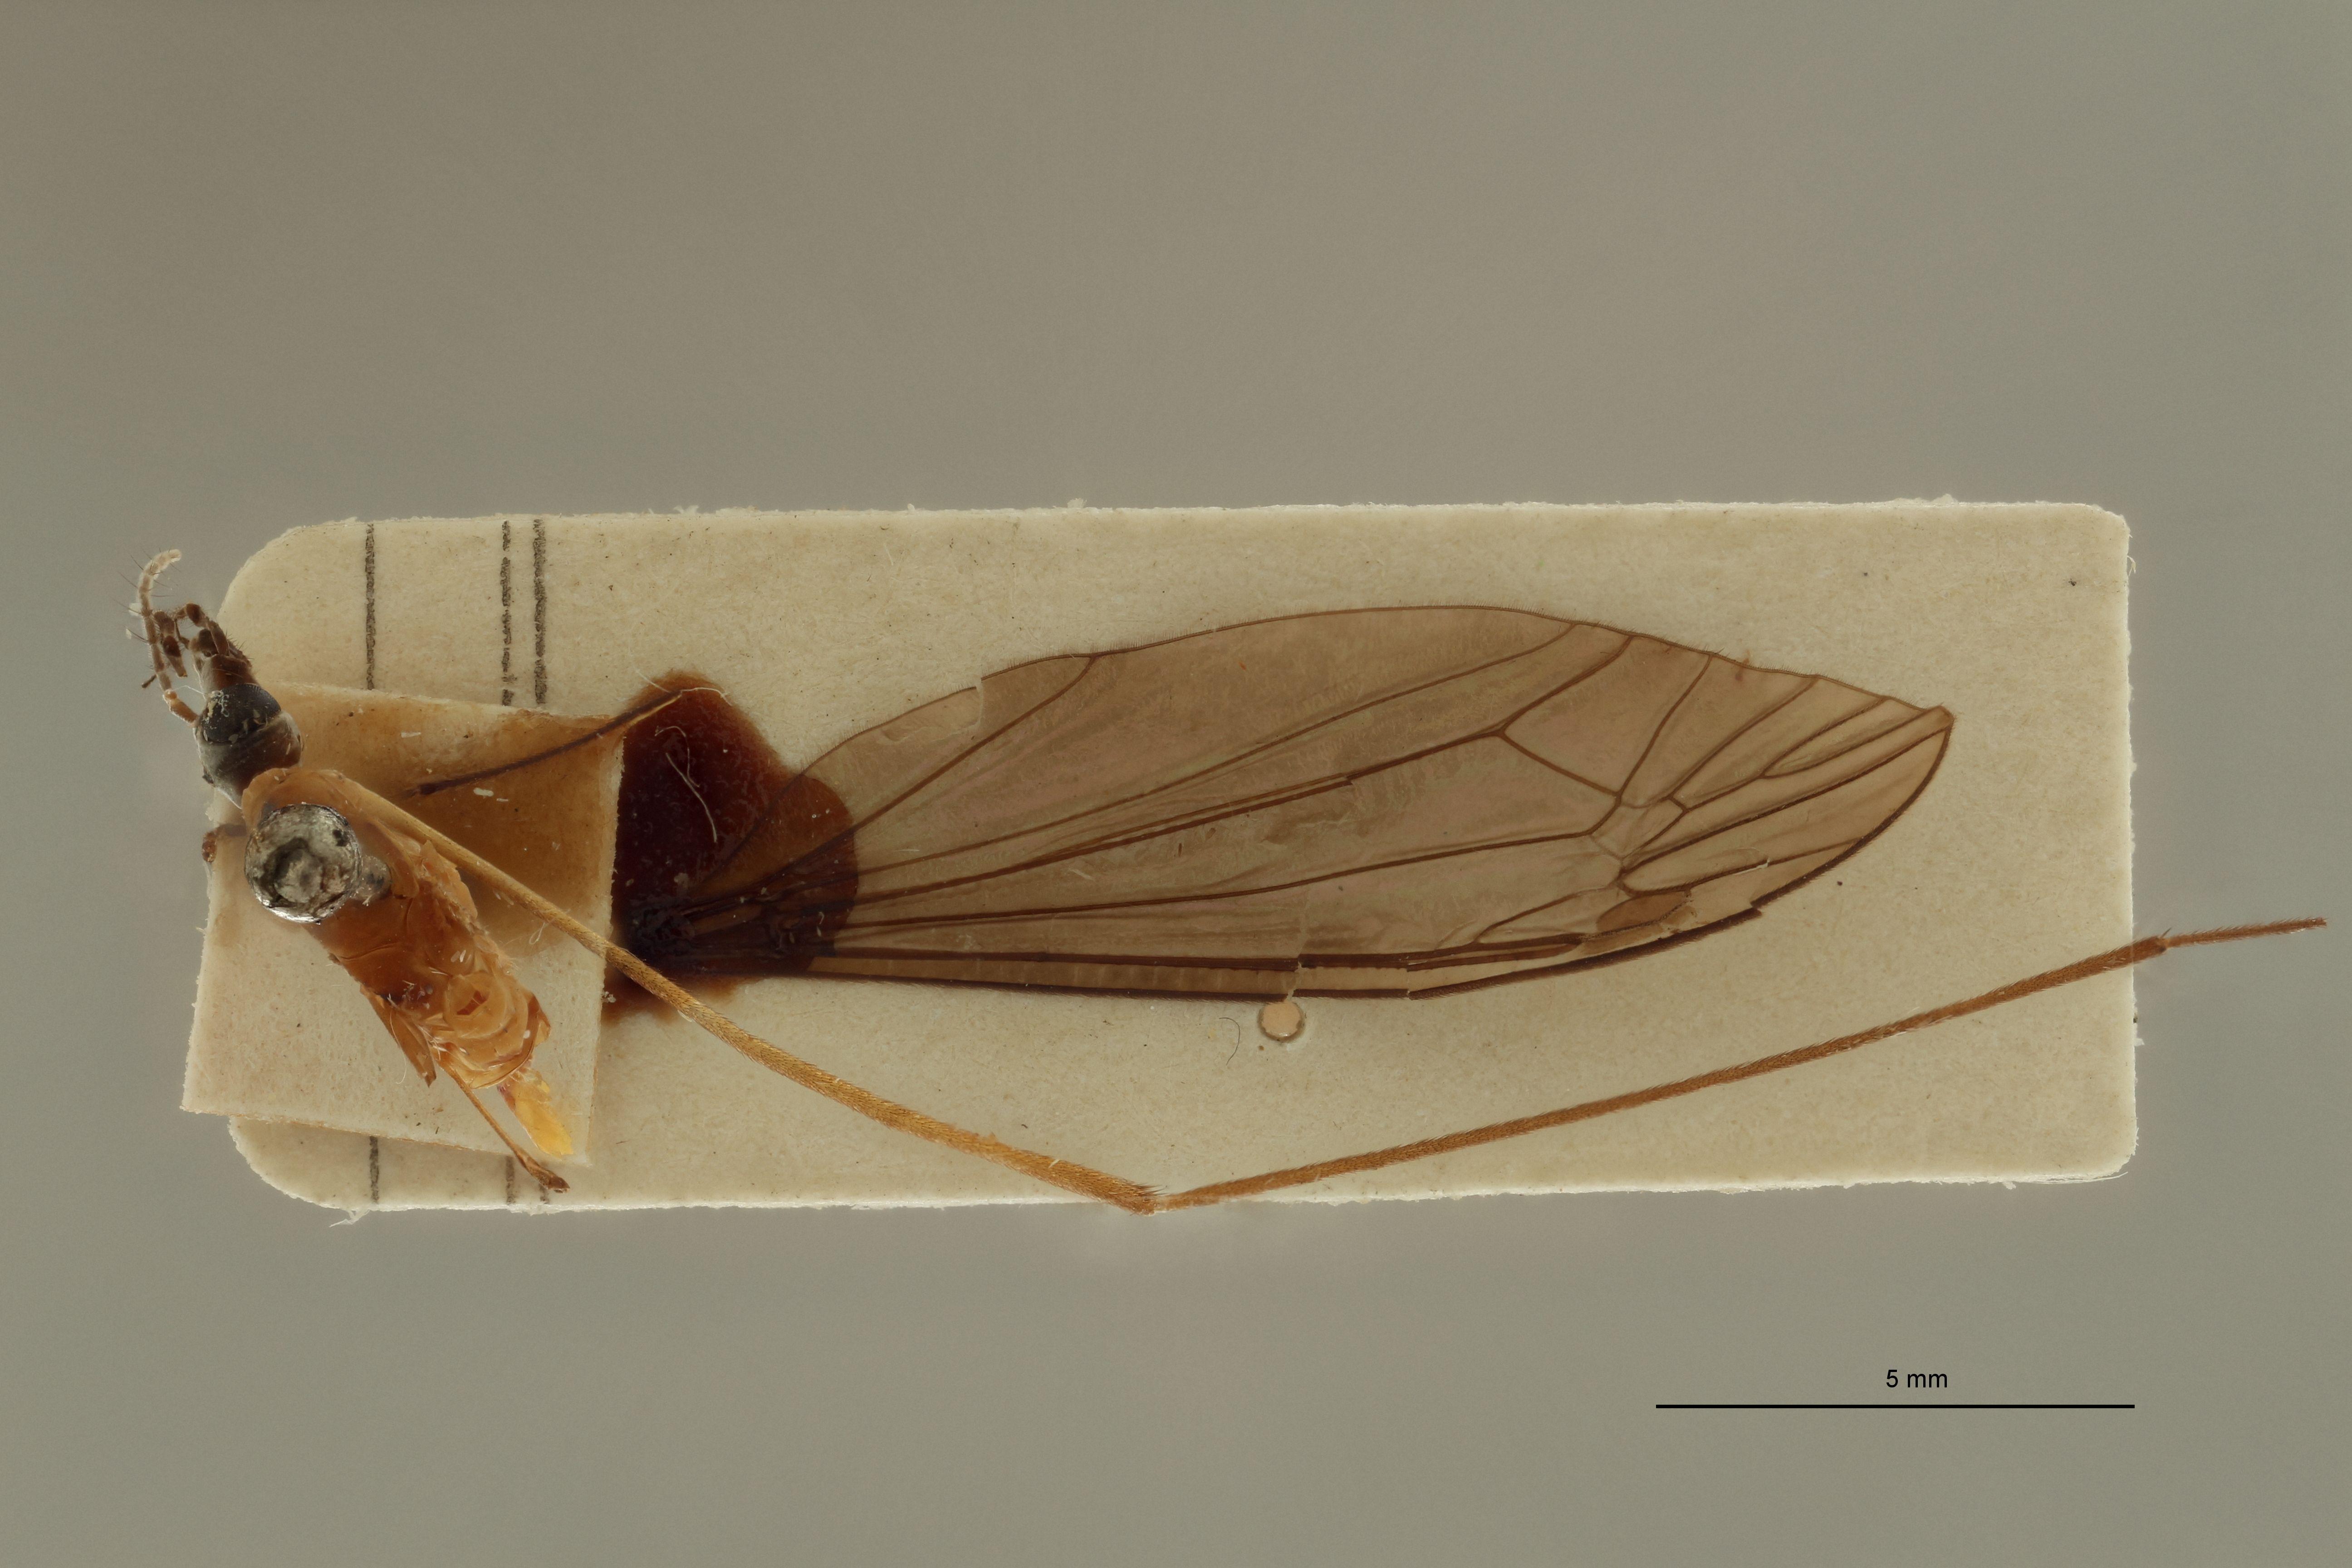 Tipula (Formotipula) leopoldi t D.jpg